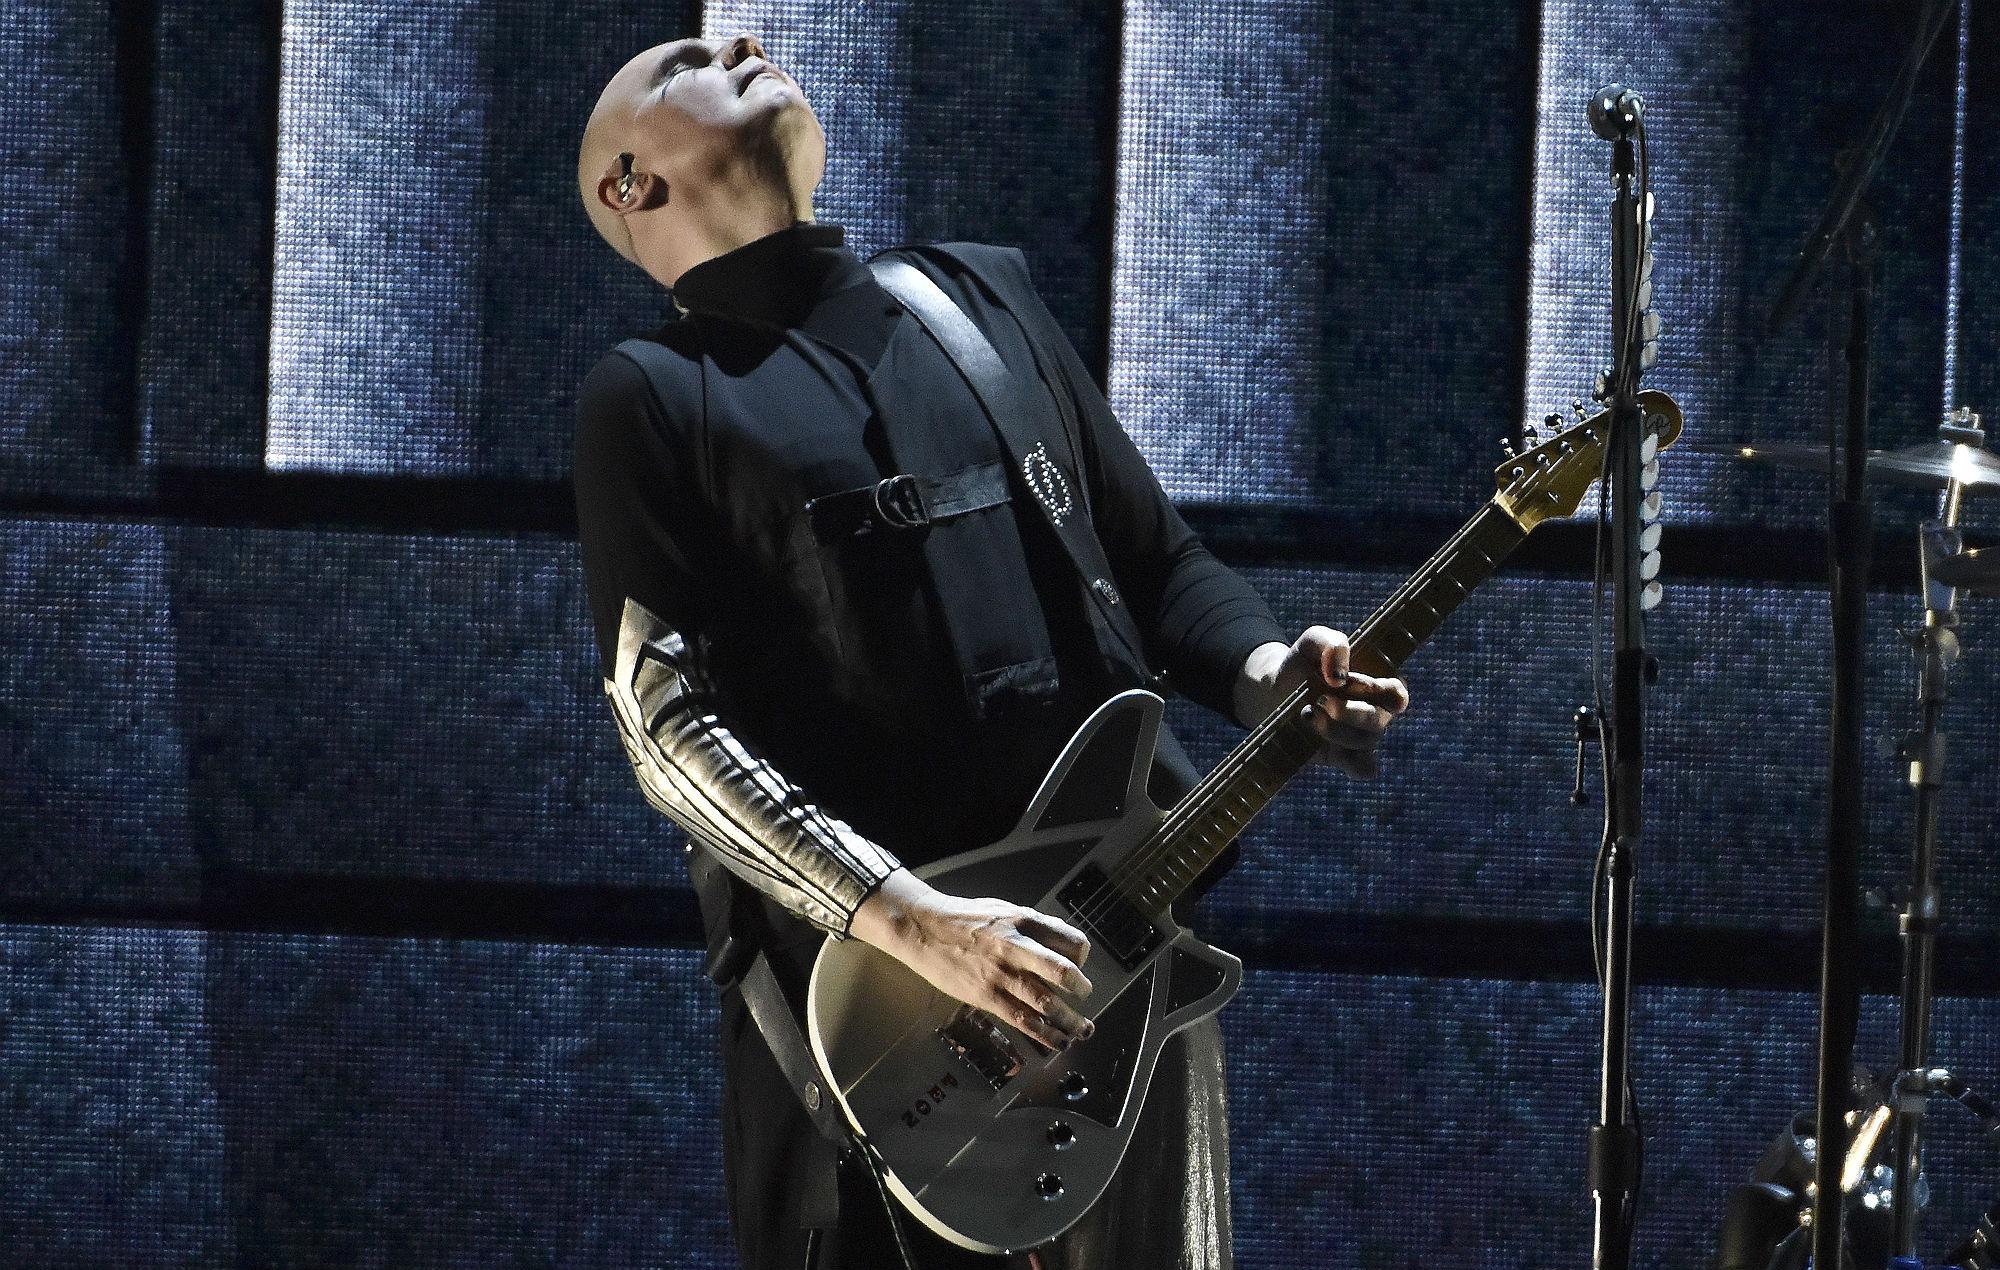 Smashing Pumpkins on their hopes to tour 'Mellon Collie & The Infinite  Sadness' in full | NME